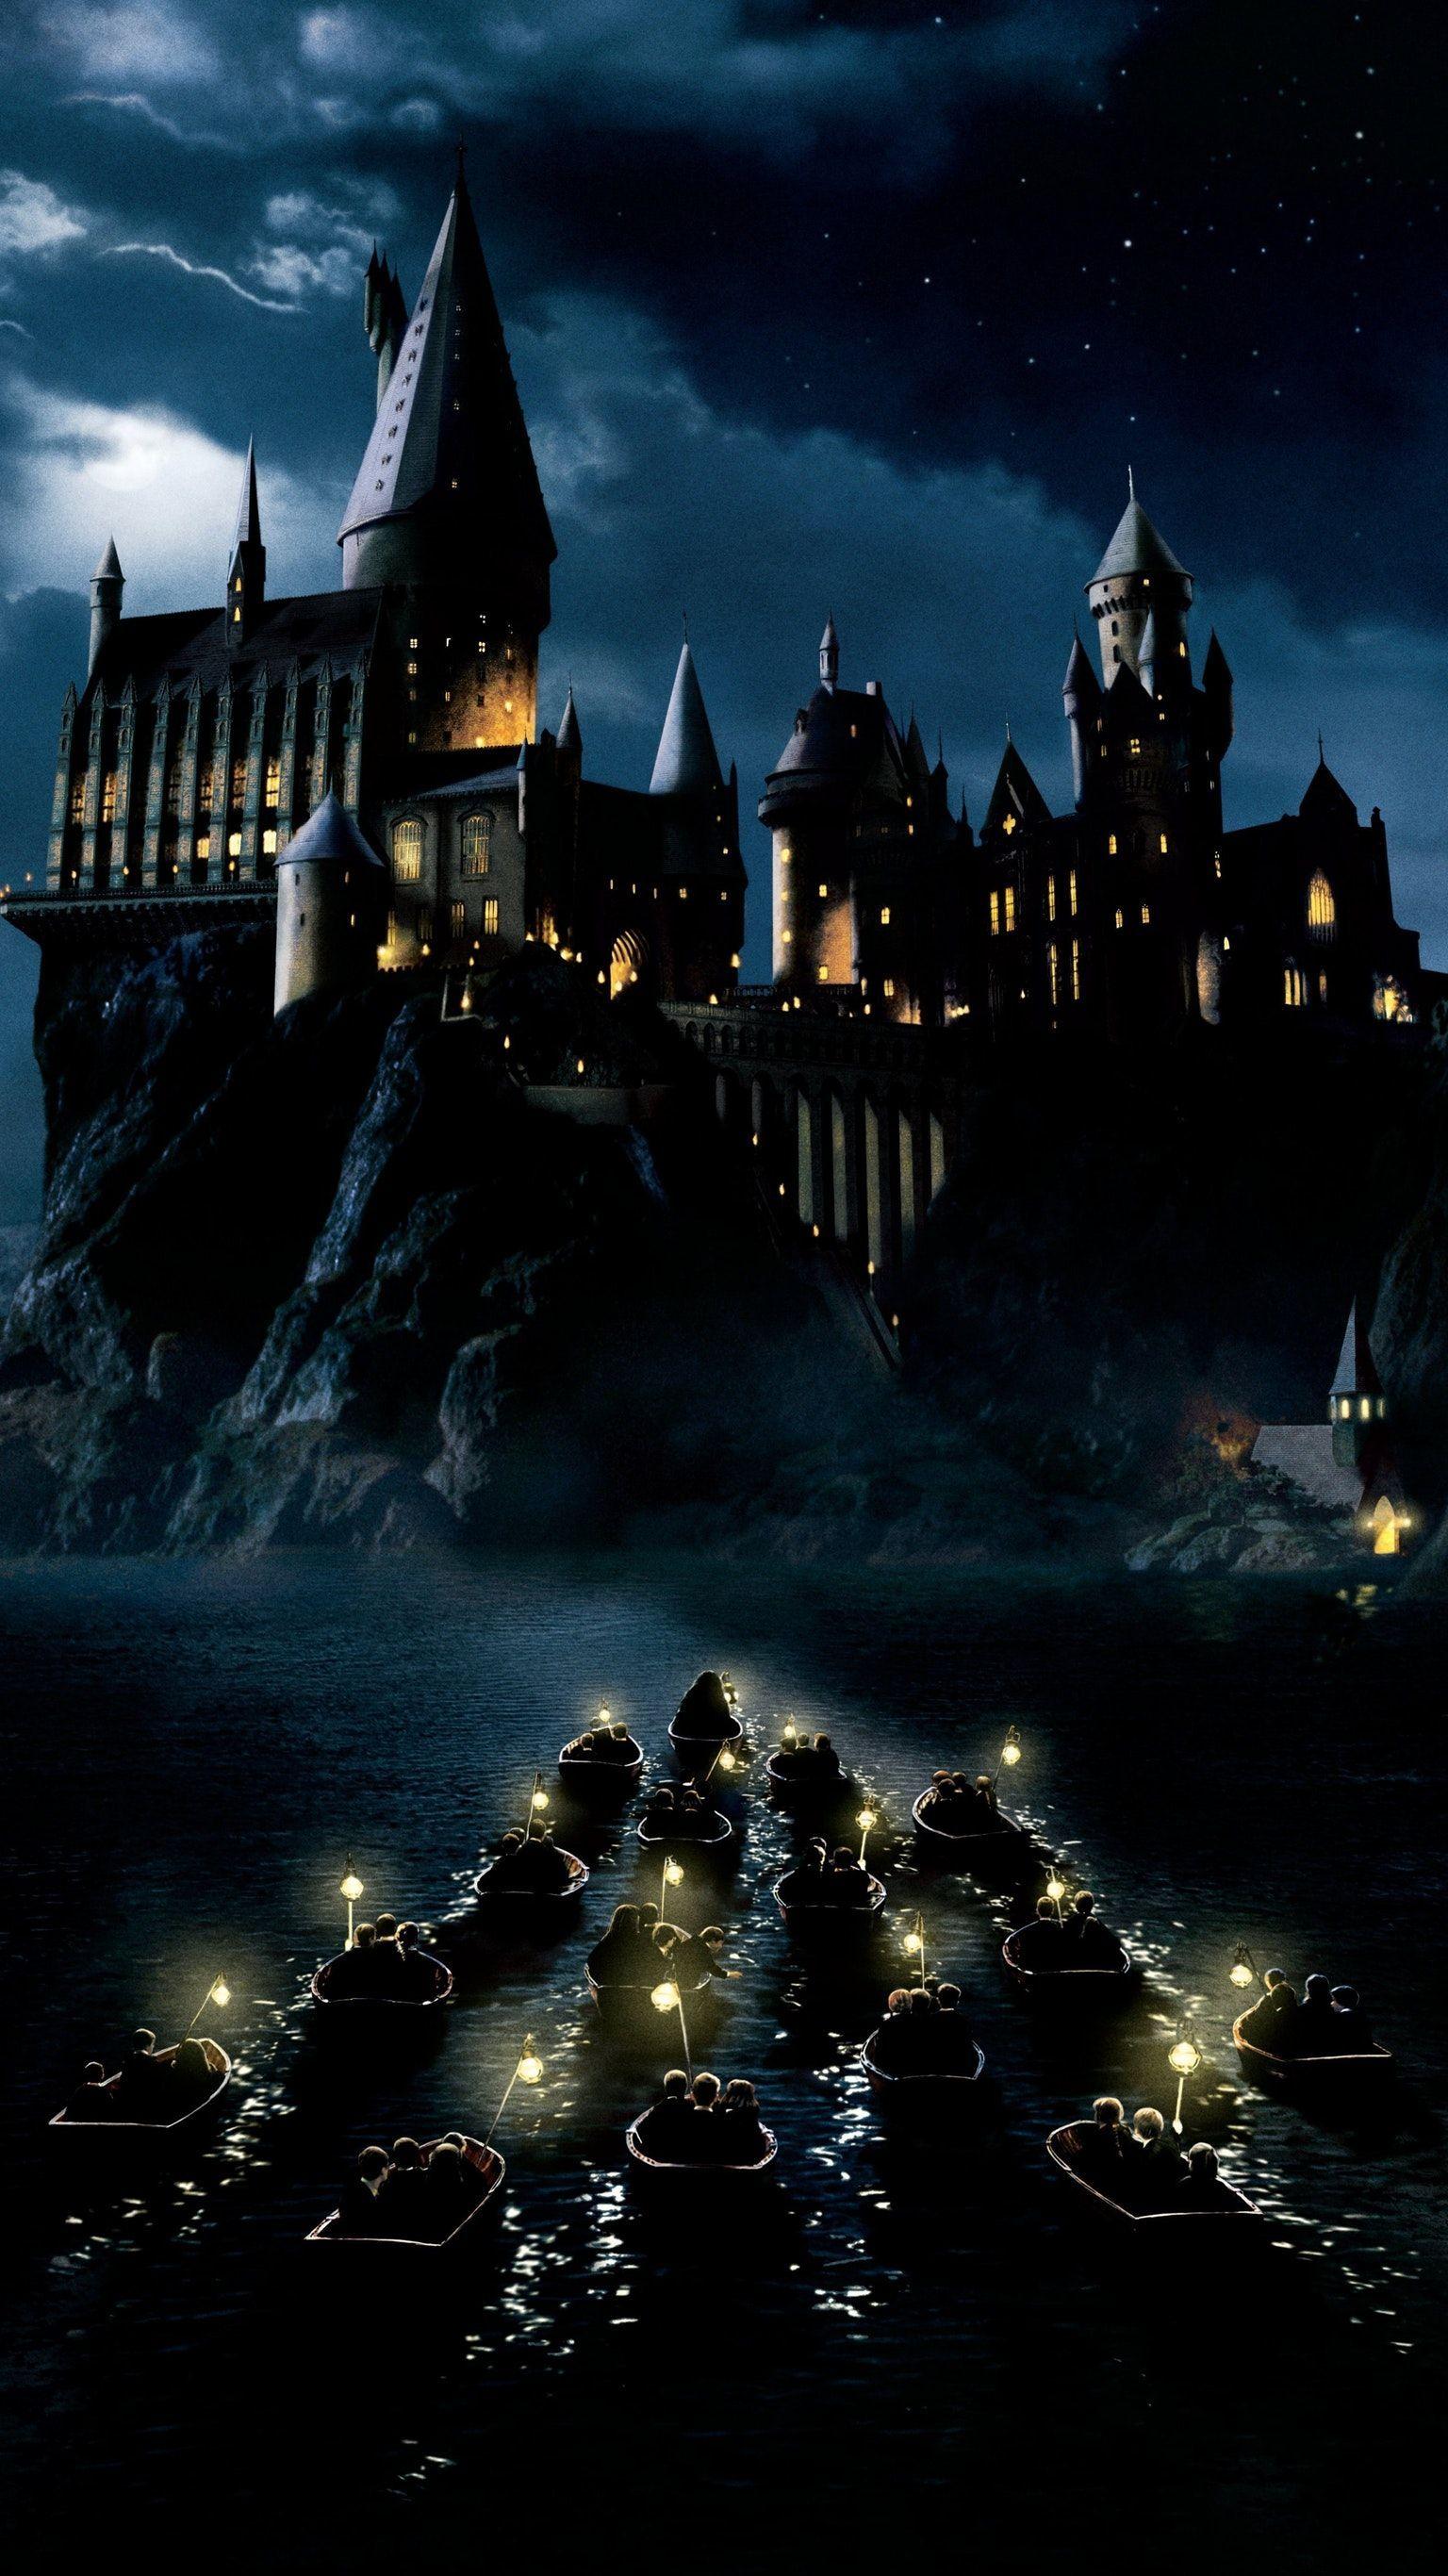 Hogwarts Castle Google Search Buyuculuk Resimler Harry Potter Filmleri